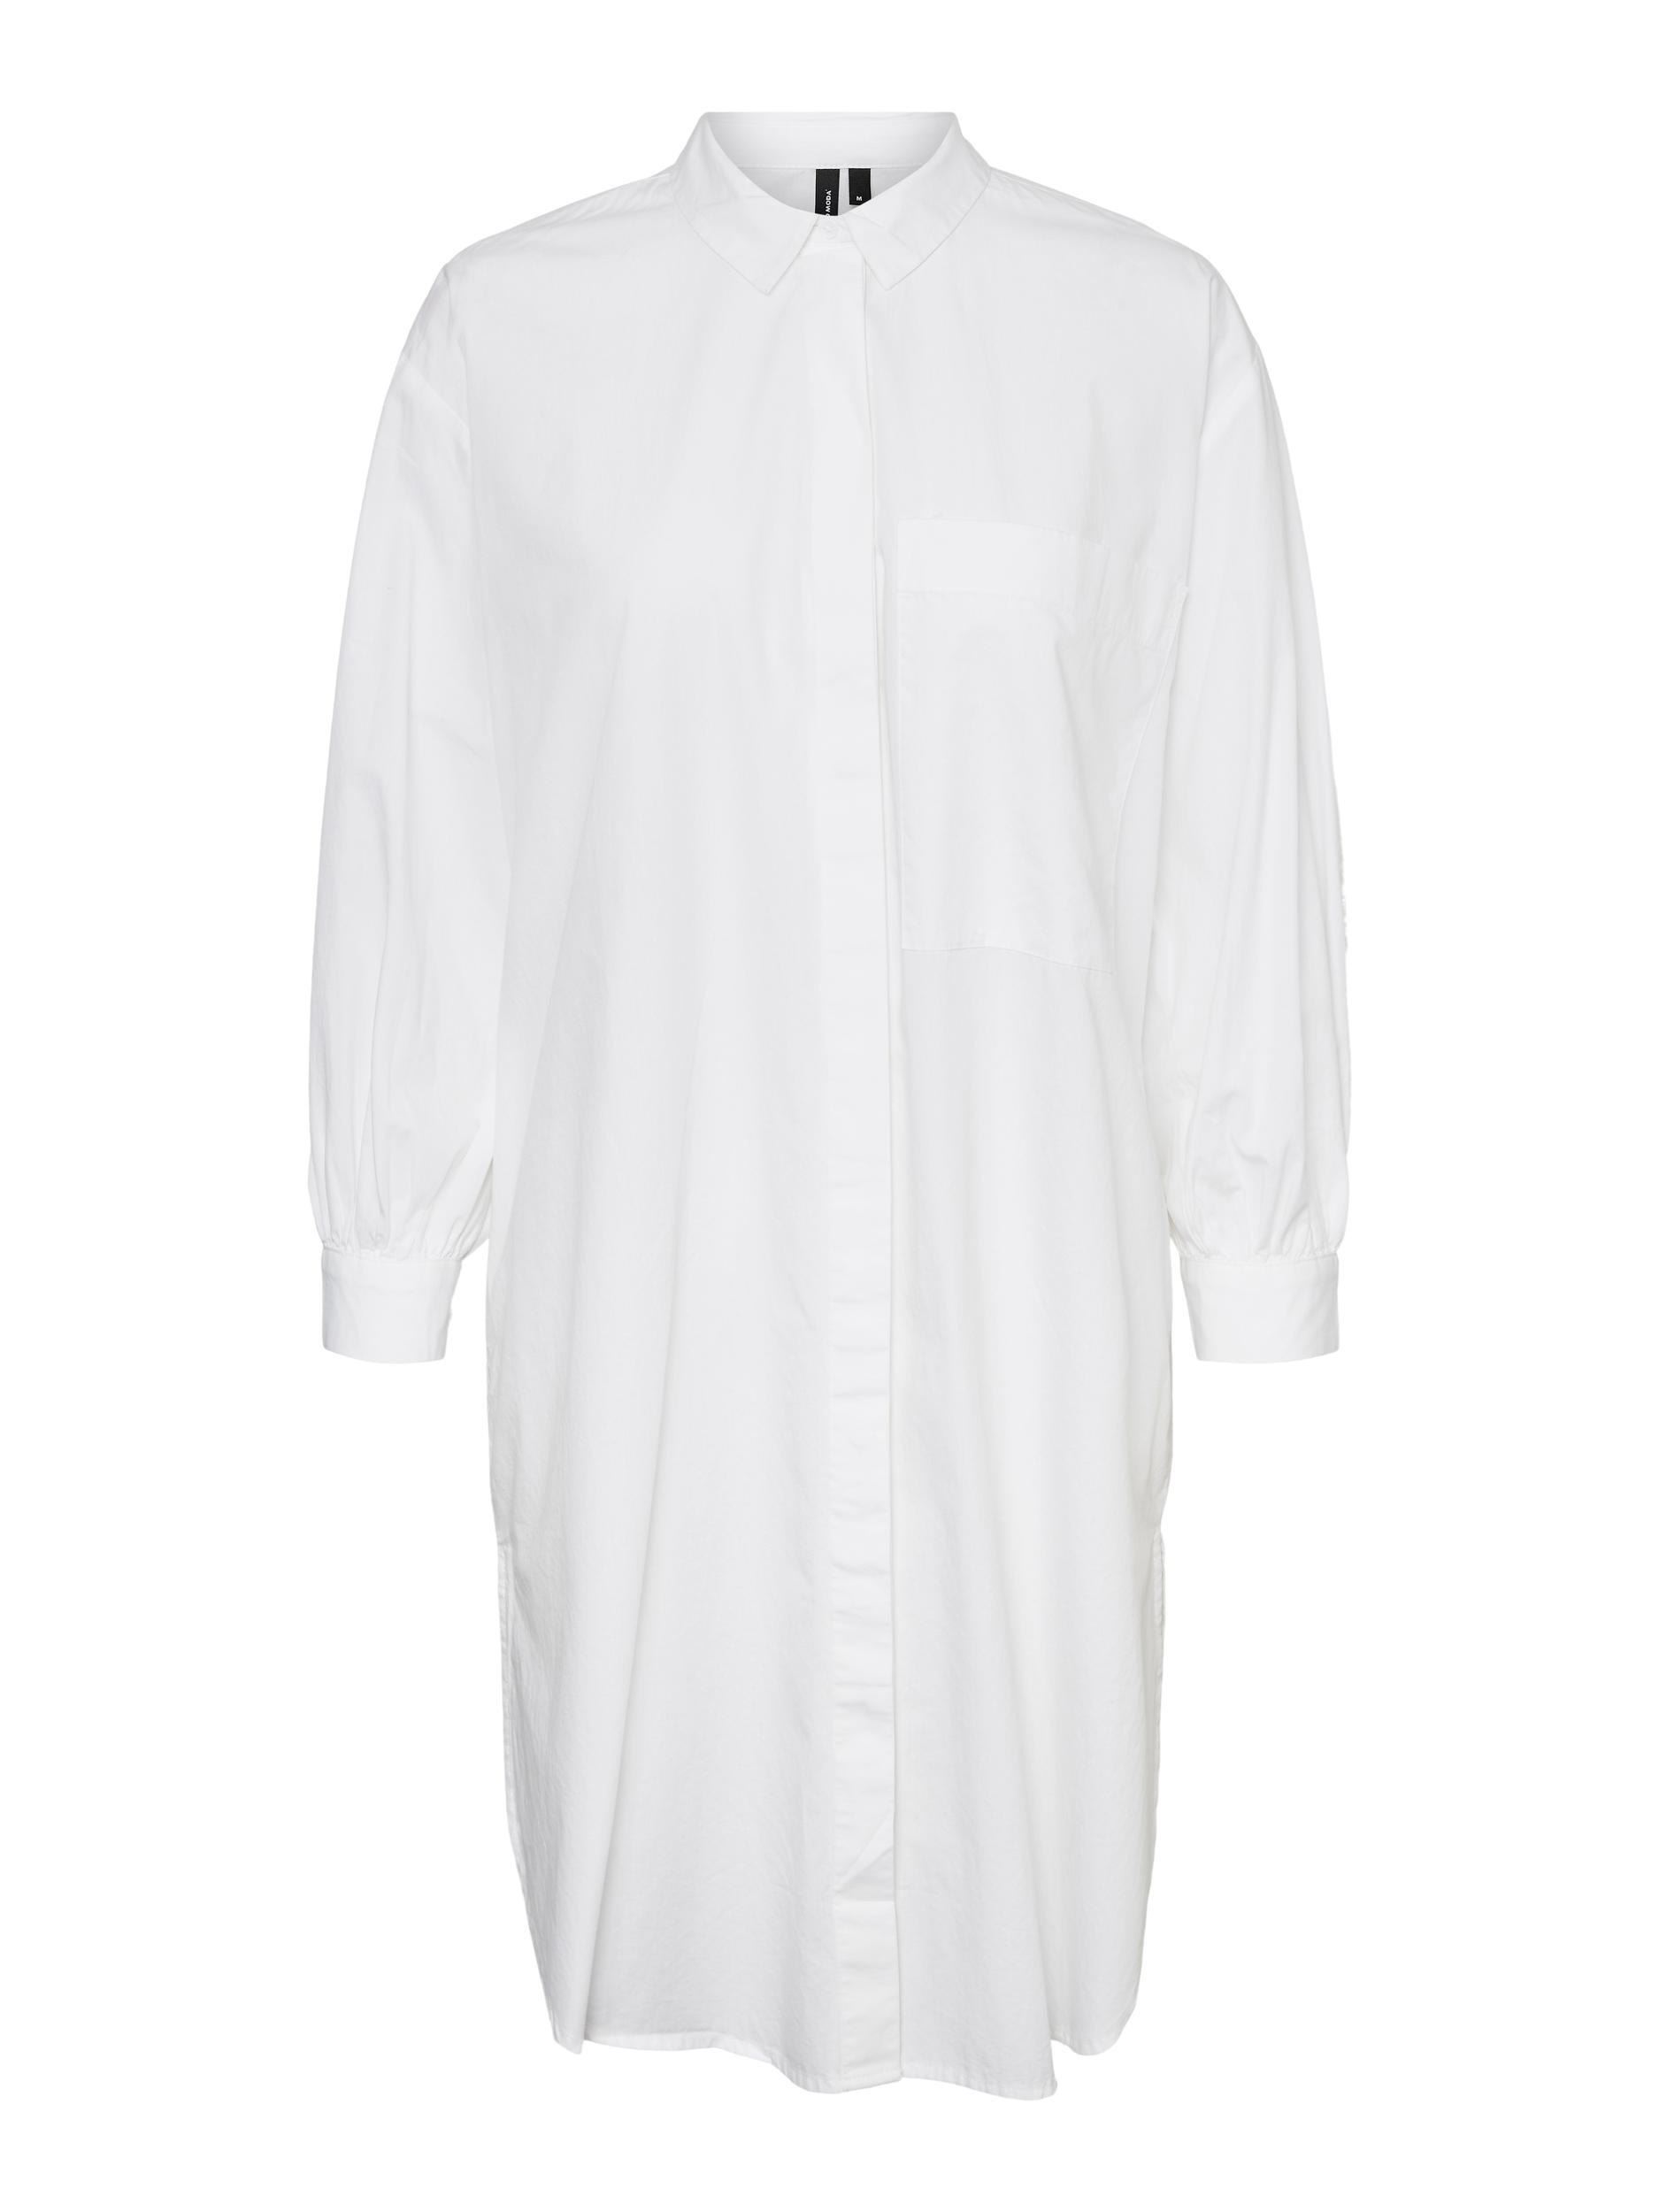 Vero Moda Hanna lang skjorte, snow white, medium